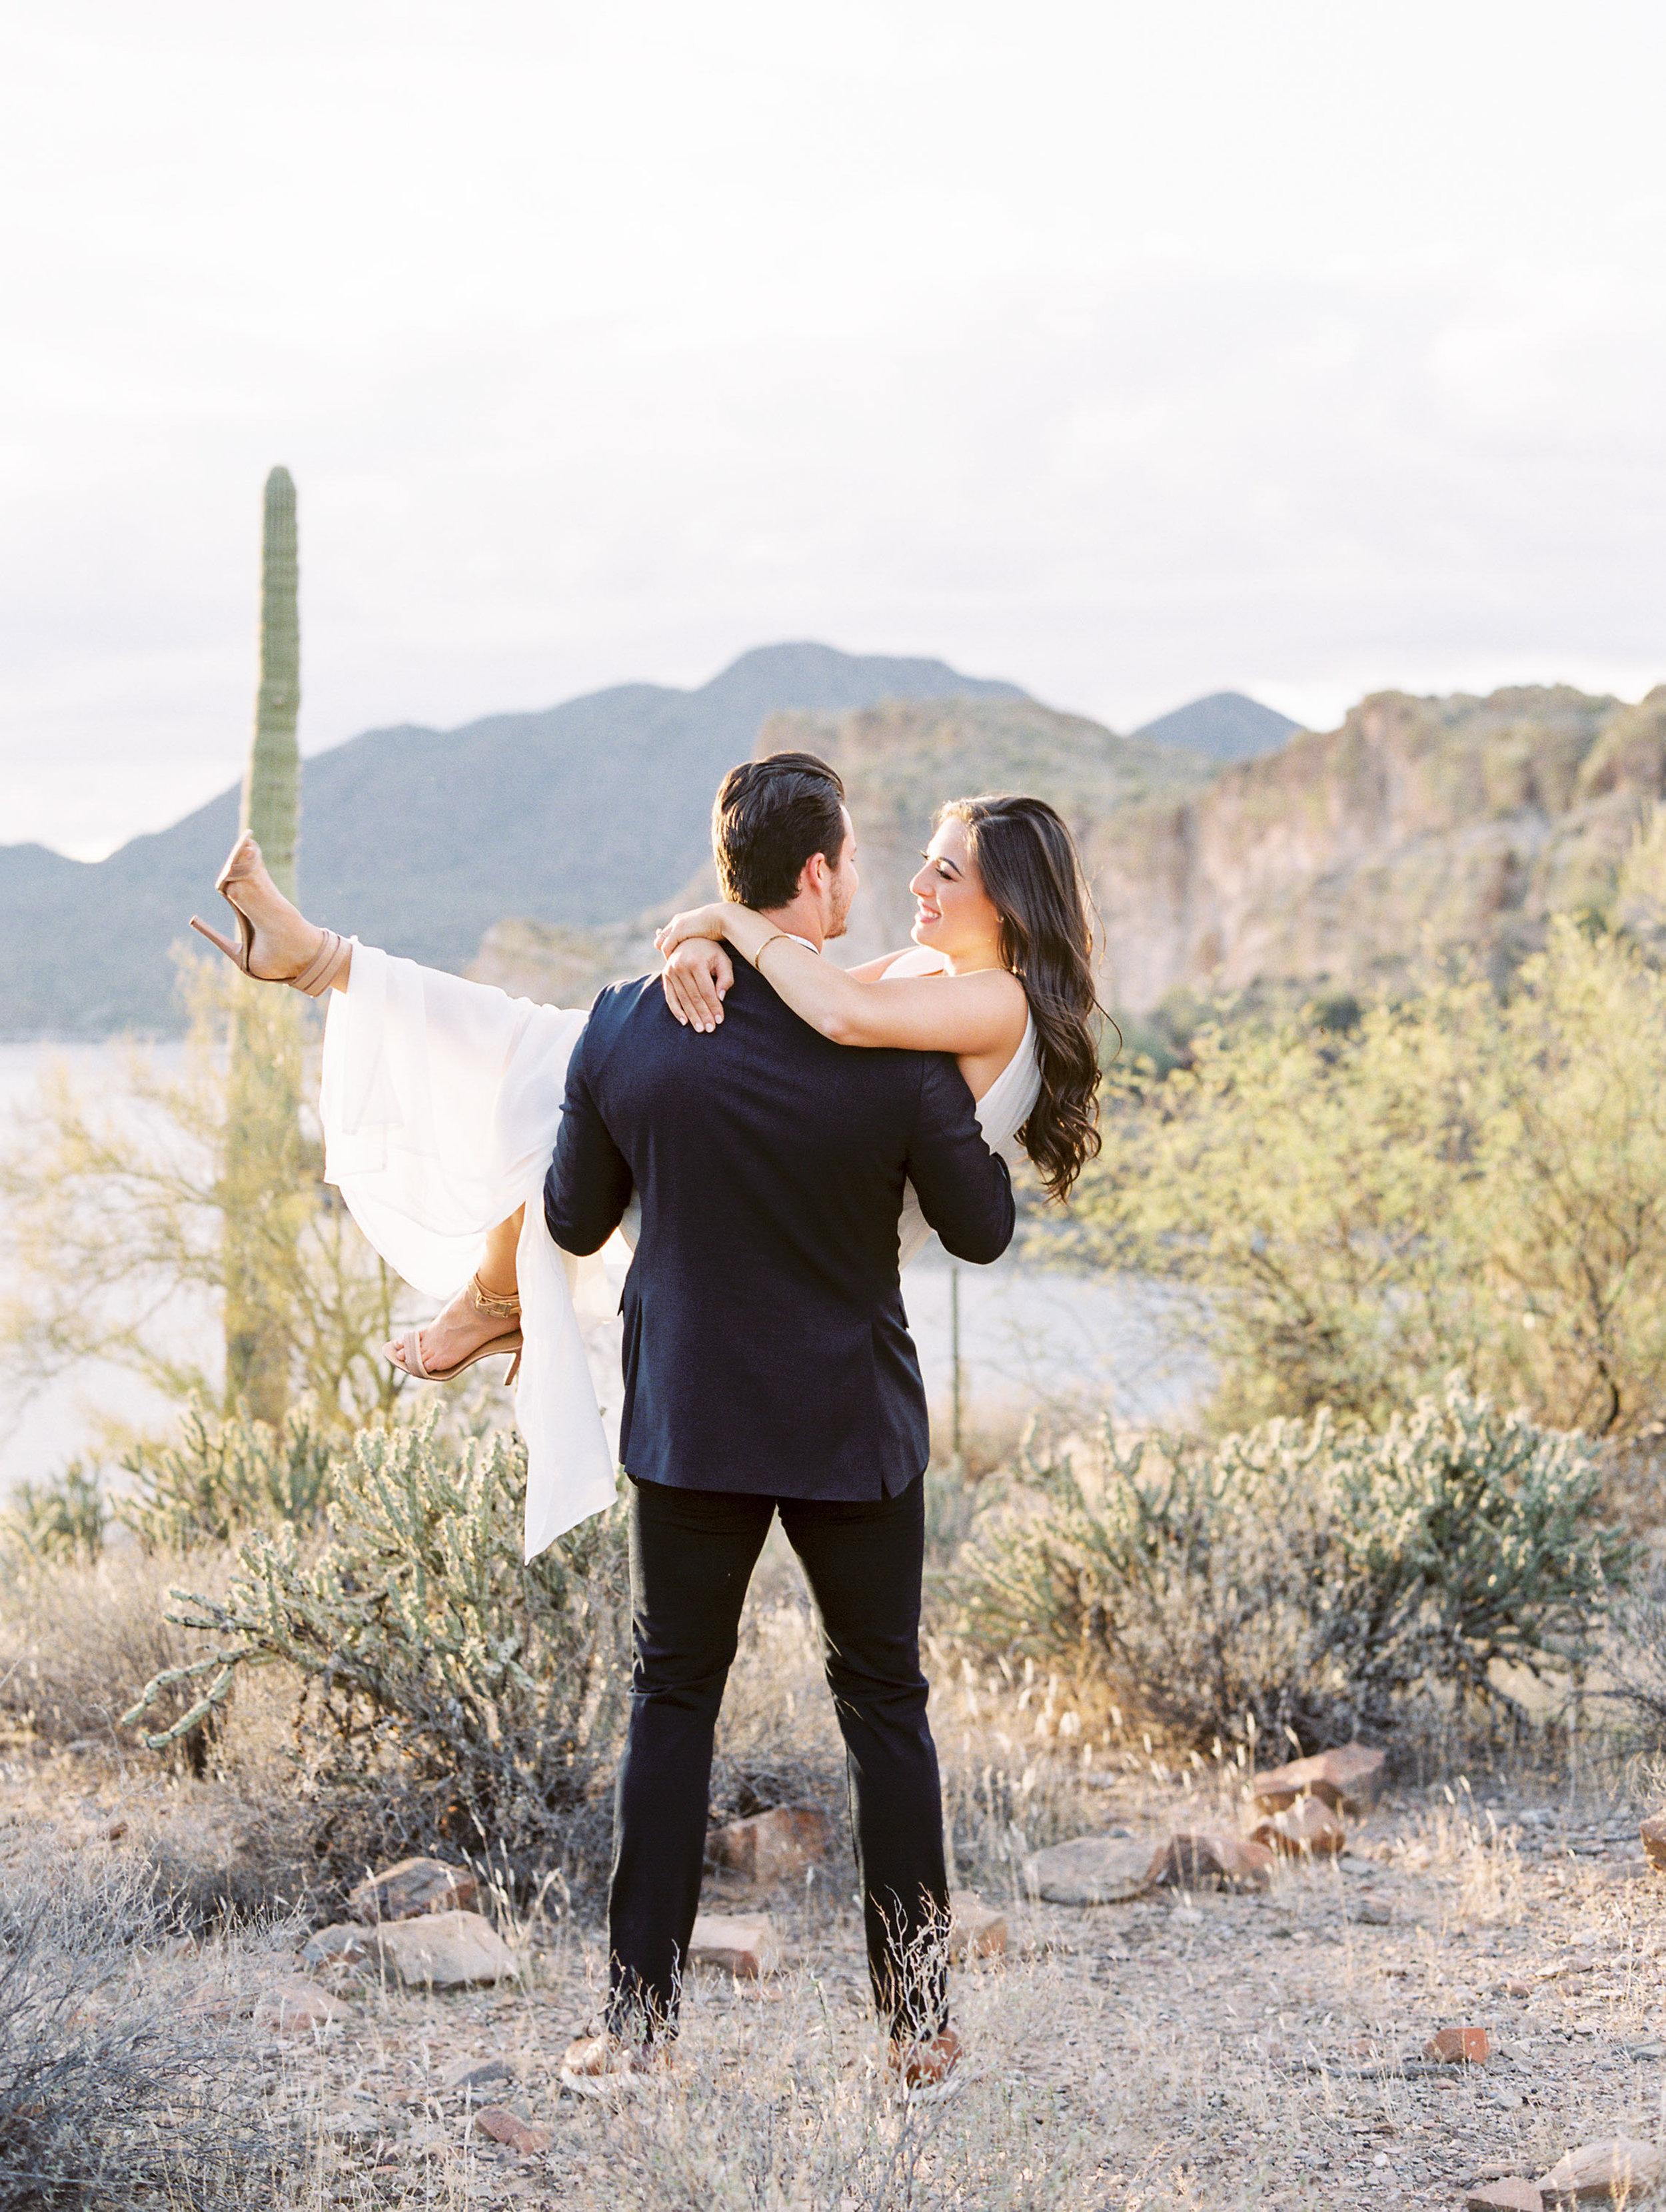 Arizona Desert Engagement Shoot: Alexa & Blake- Konsider It Done- AZ Arizona Wedding & Event Planner, Designer, Coordinator Planning in Scottsdale, Phoenix, Paradise Valley, Tempe, Gilbert, Mesa, Chandler, Tucson, Sedona